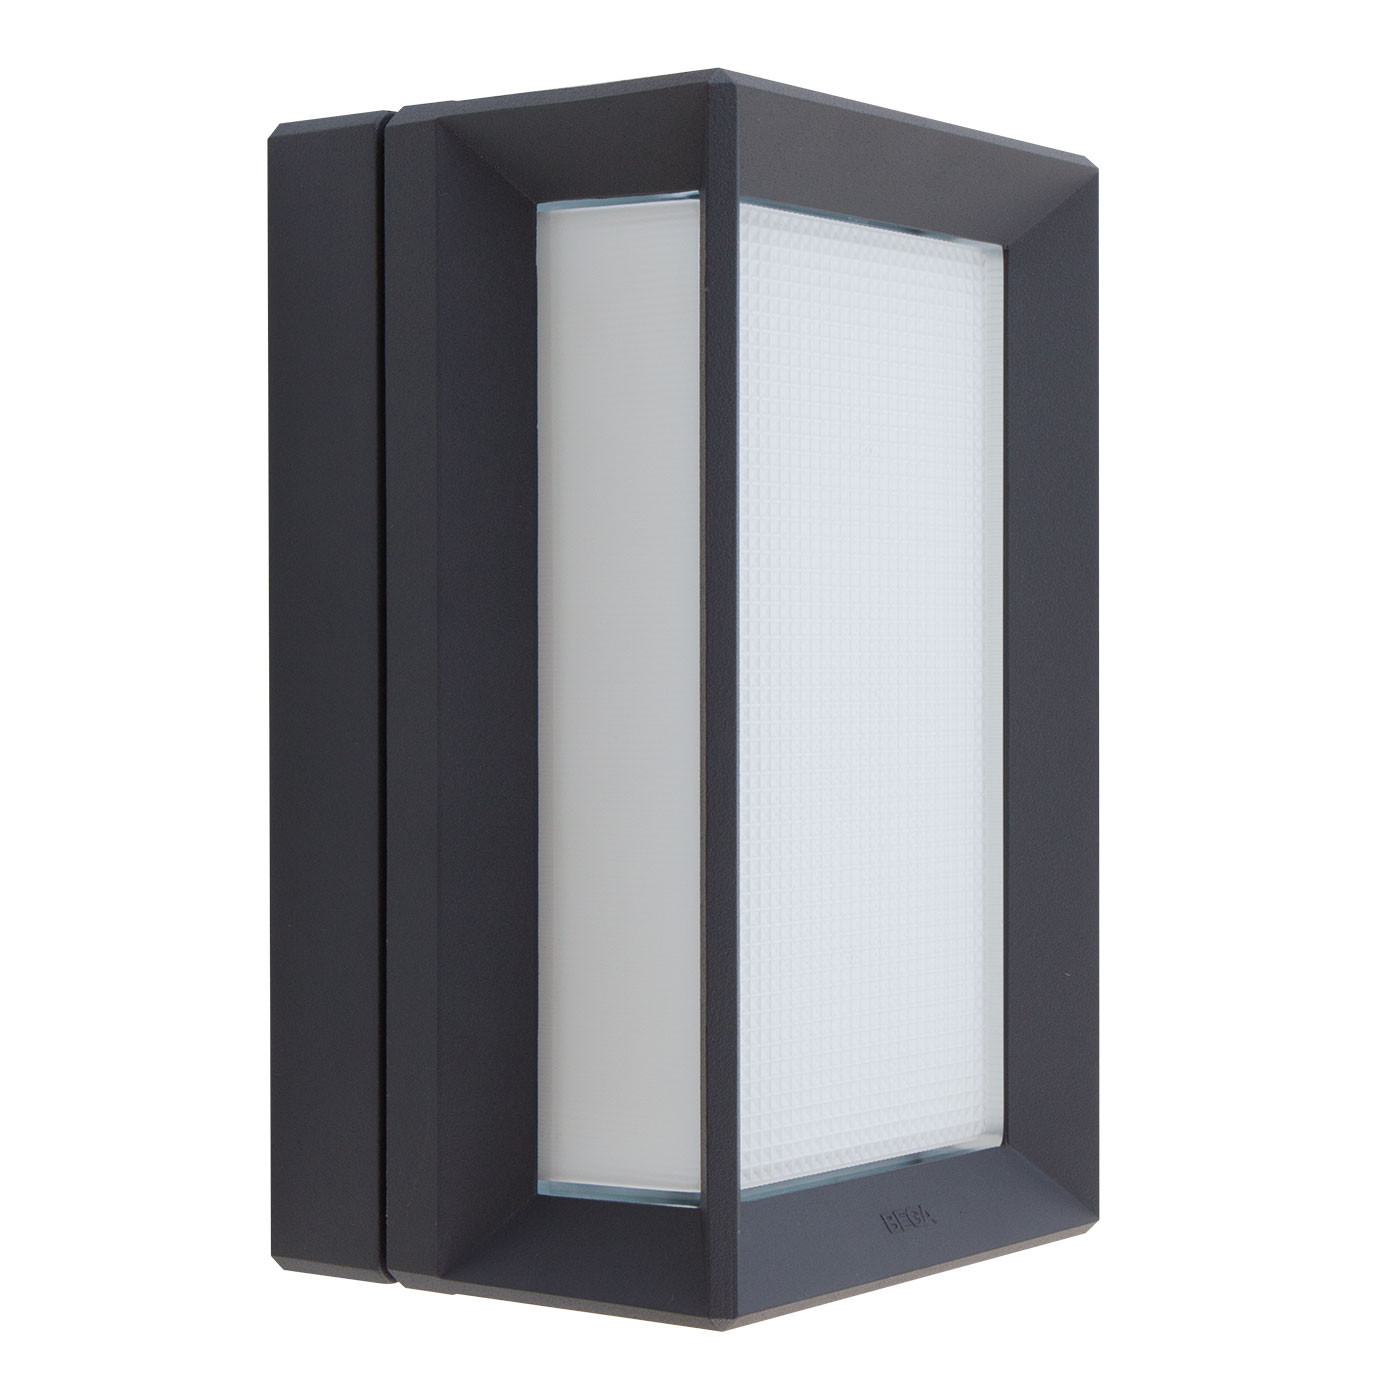 Bega 22750 LED Wand-/Deckenleuchte